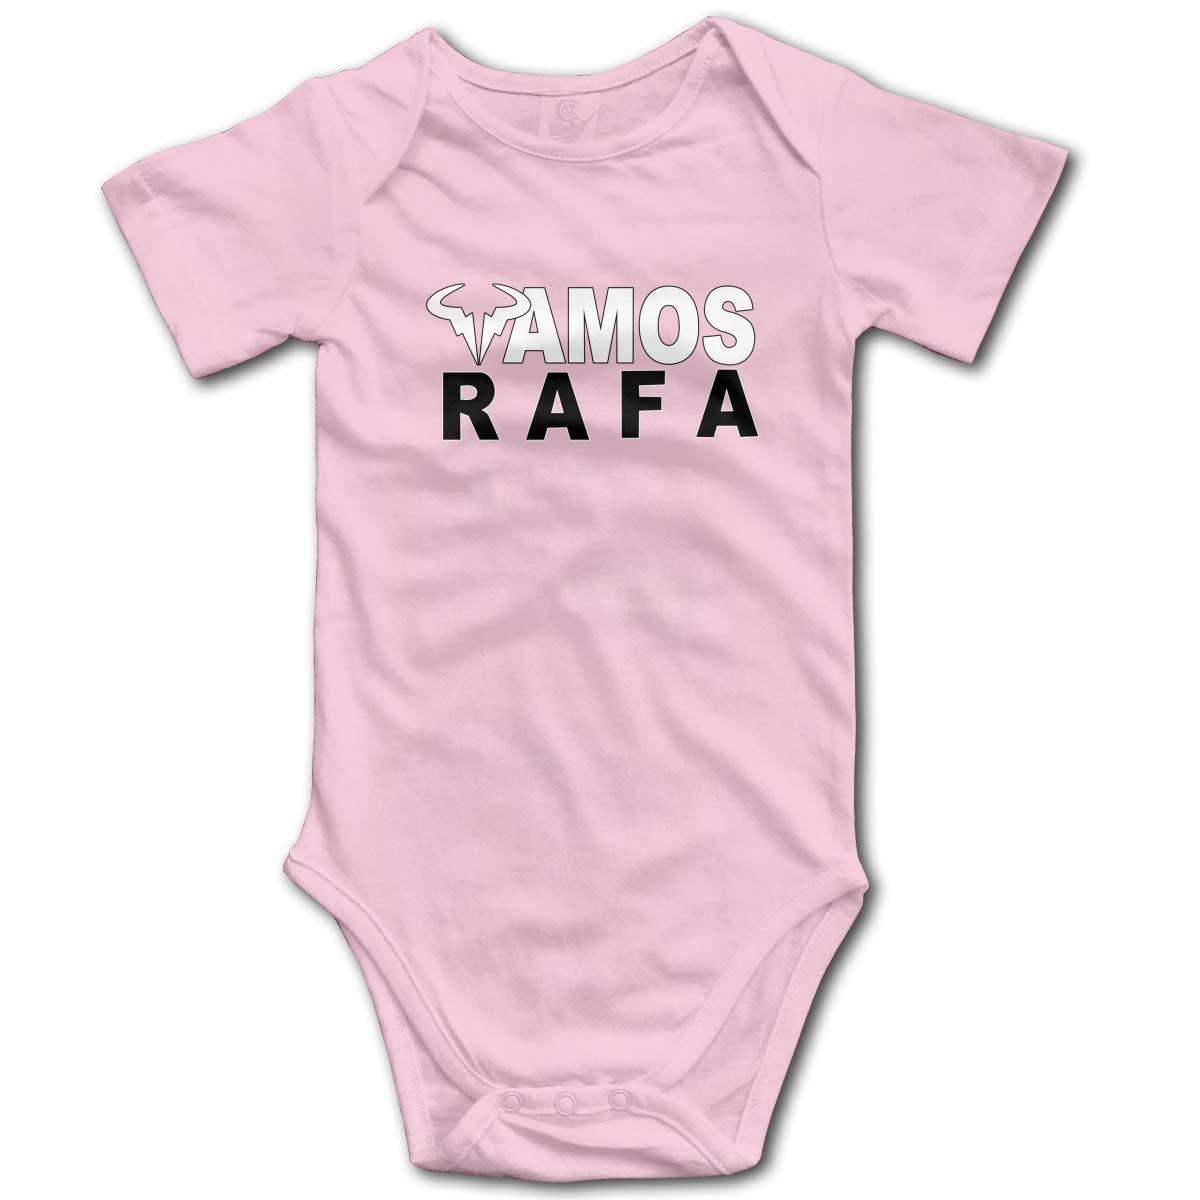 Koucas Baby Girls Boys RAFA Vamos Rafael Nadal Logo Kids Bodysuits Short Sleeve Cotton Tshirt T Shirt Tollder Clothes Pink 0-3M by Koucas